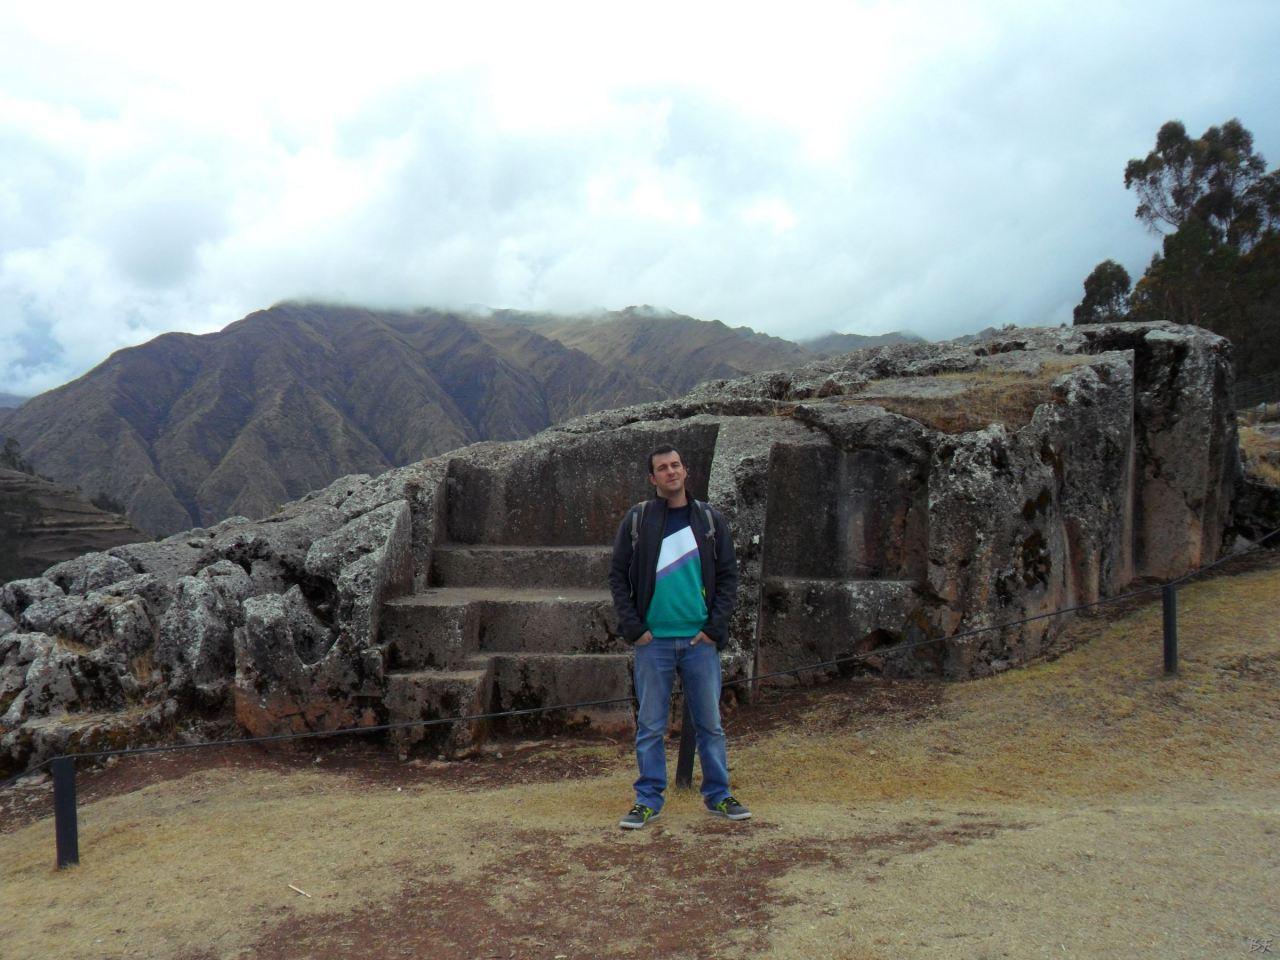 Chinchero-Mura-Poligonali-Piramide-Urubamba-Peru-44